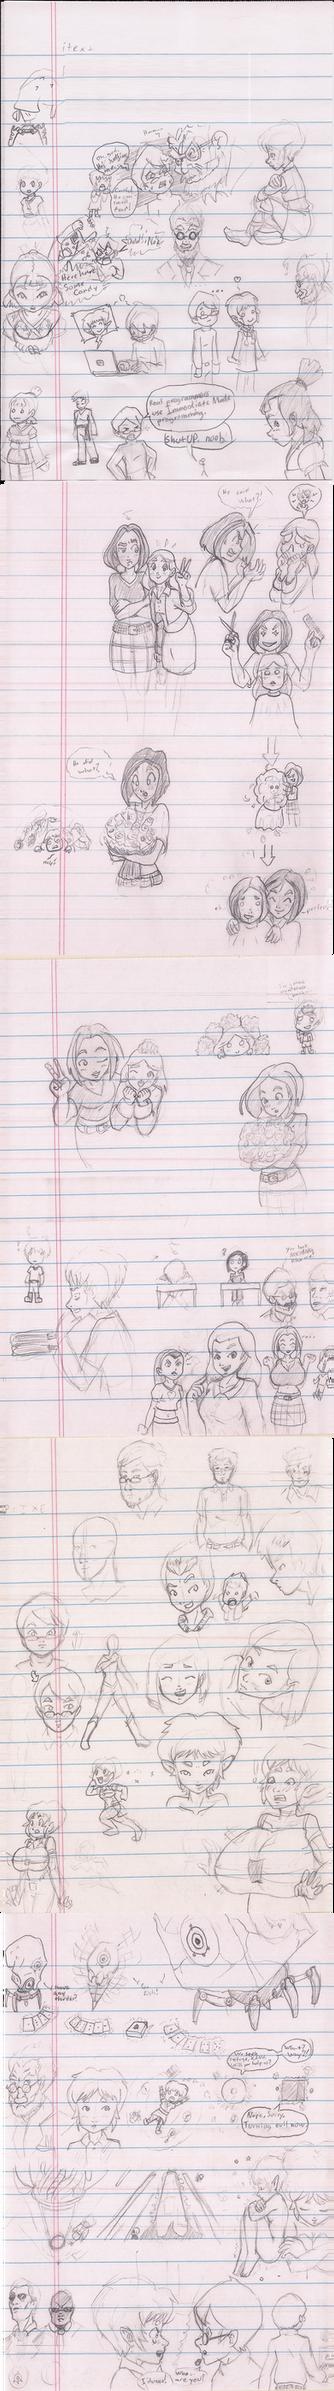 Doodle Dump (January 2015) by Zcmrrd